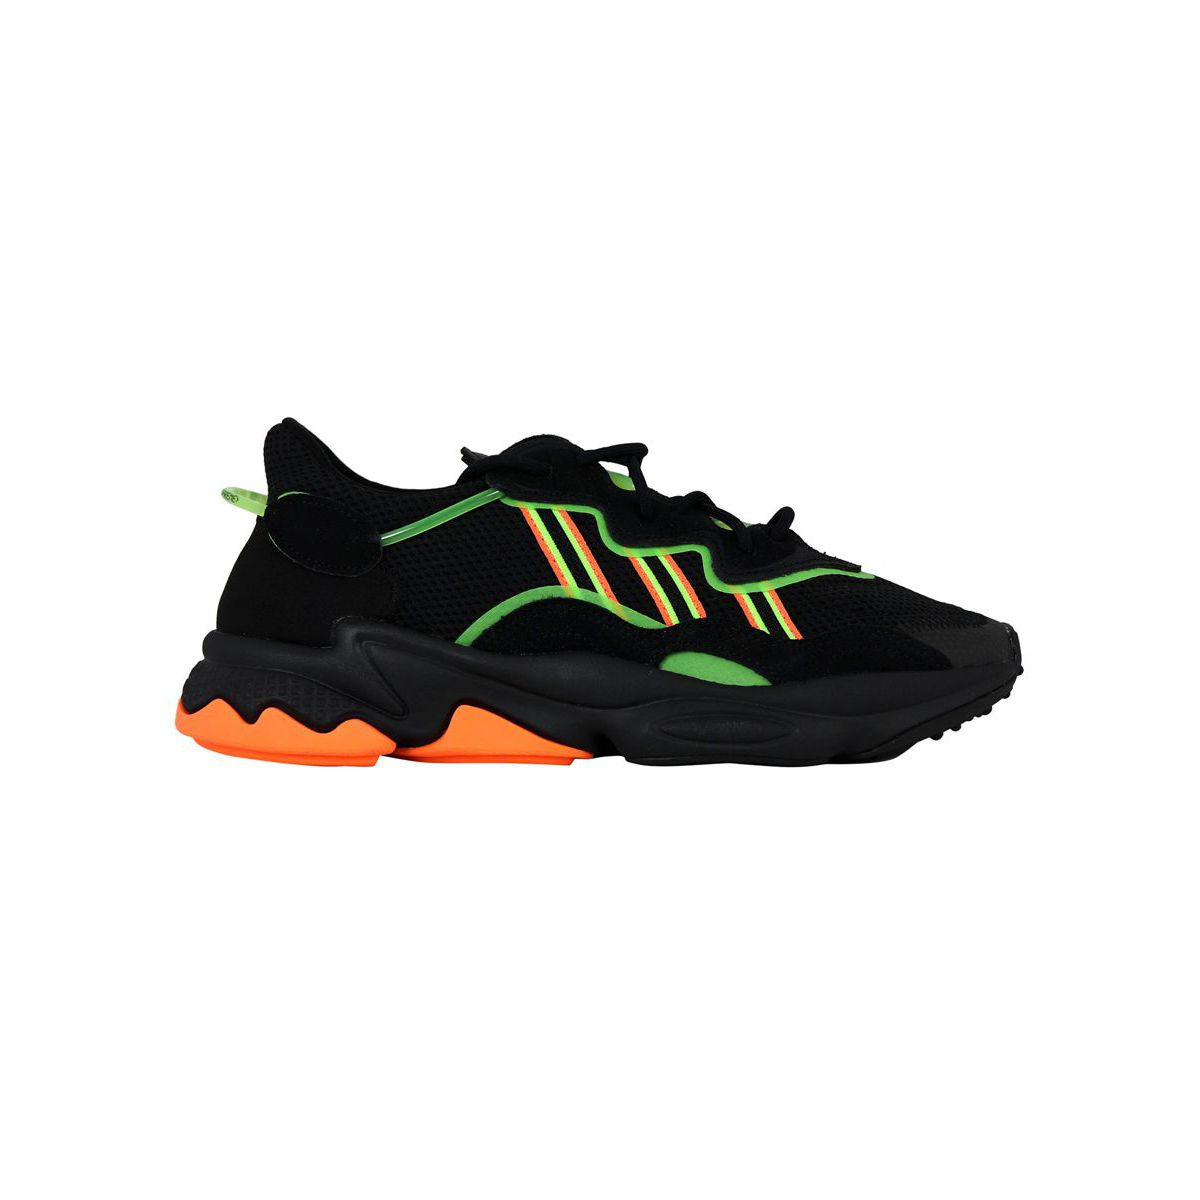 Sneakers OZWEEGO EE5696 Black Adidas